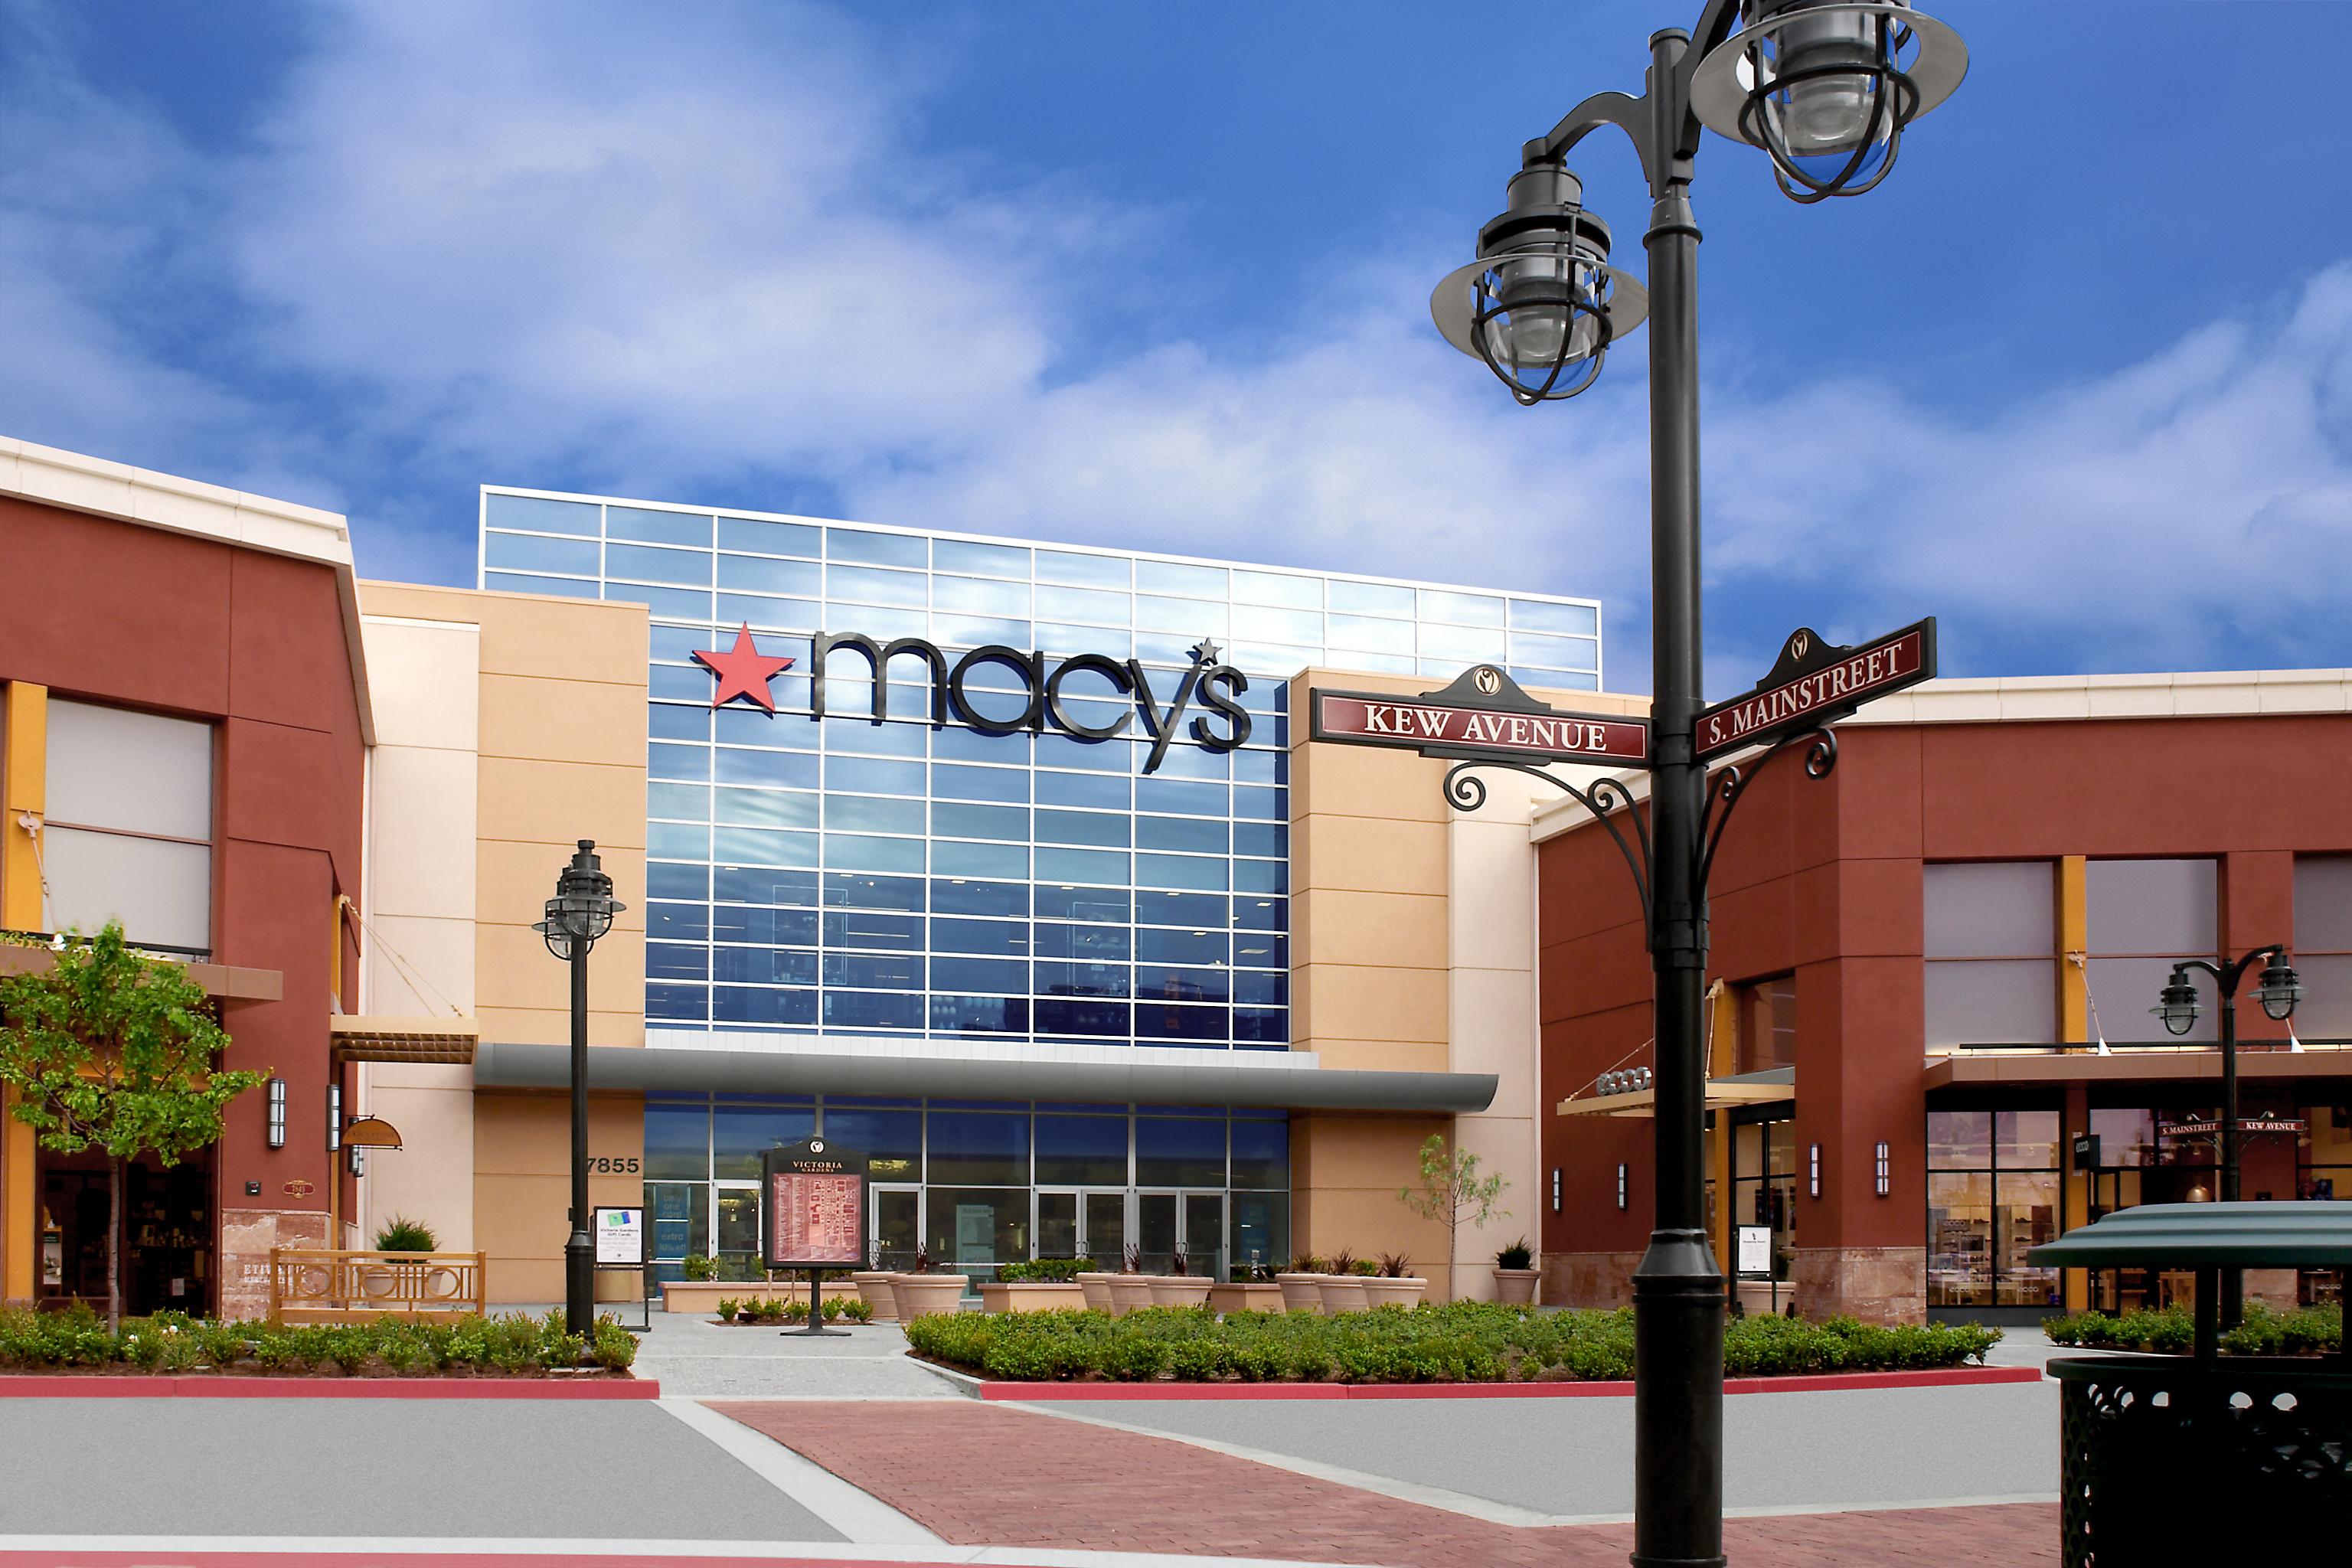 A Macy's store